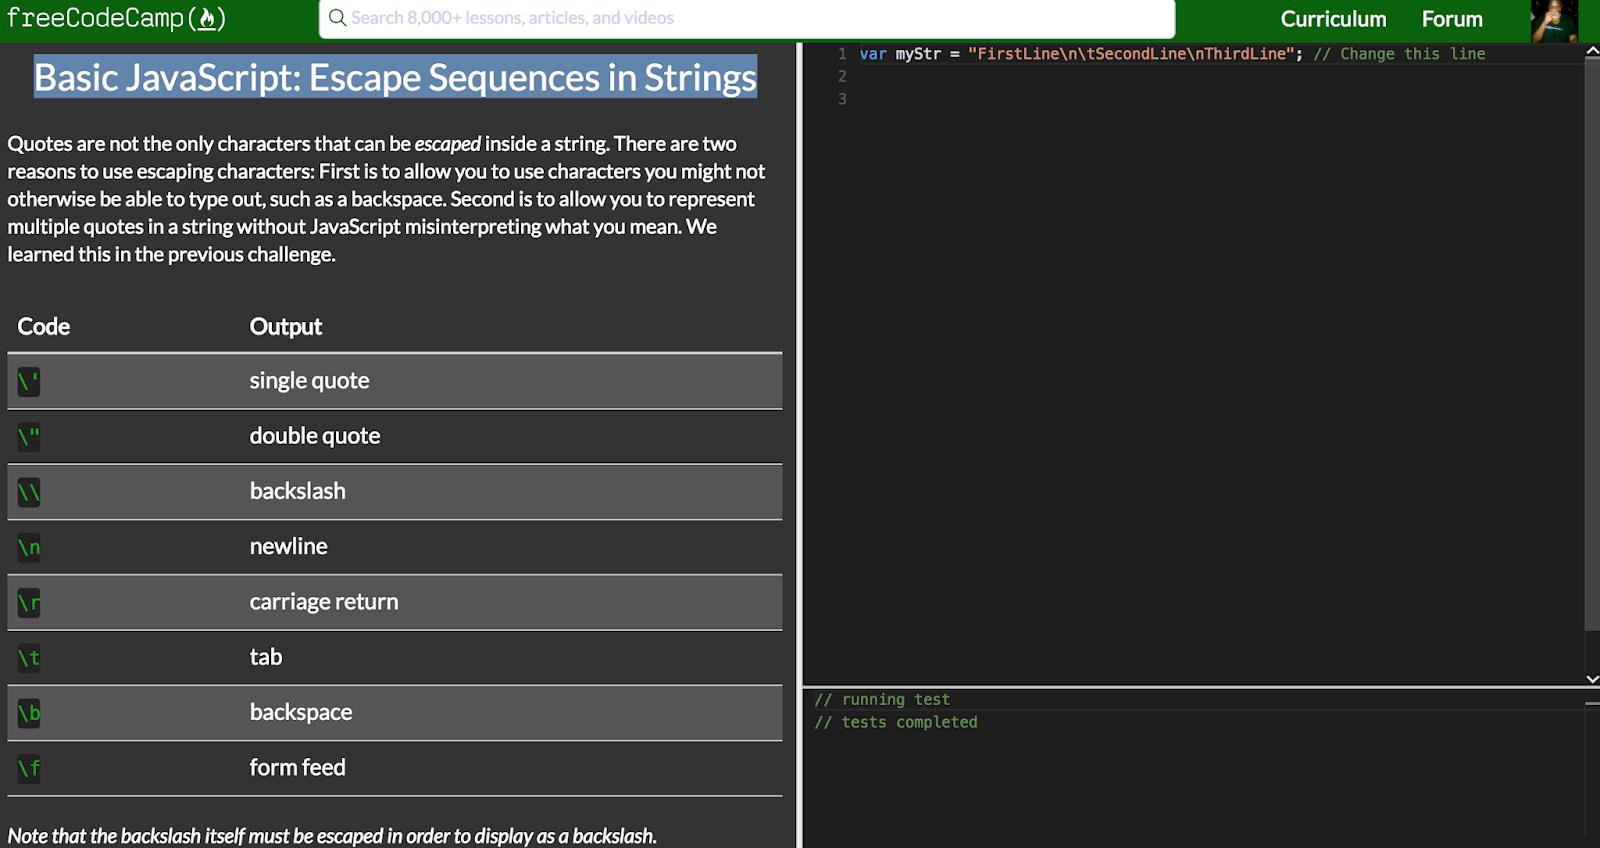 Just a Few Things  : #100DAYSOFCODE D28 - Basic JavaScript